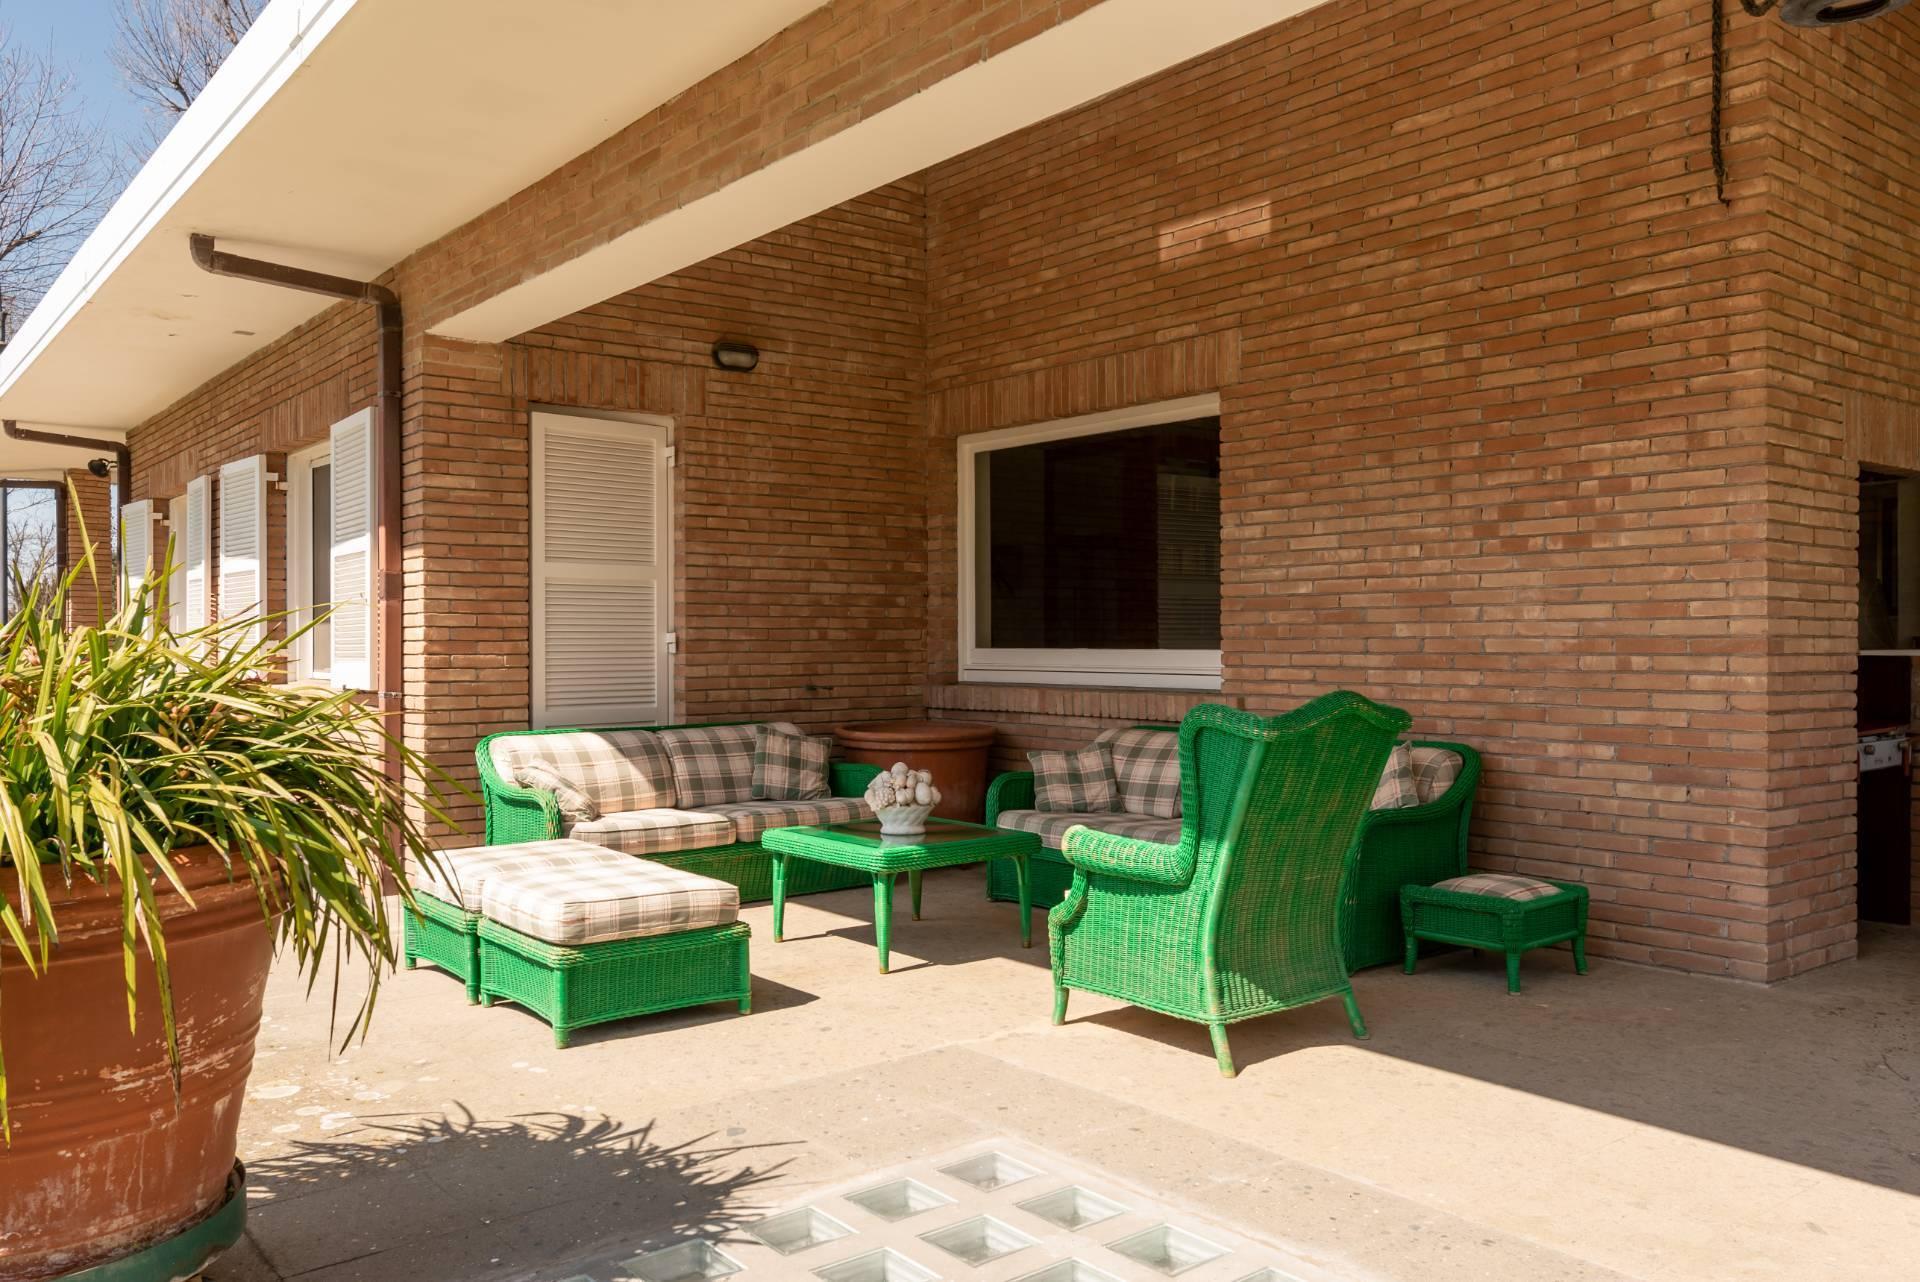 Villa in Vendita a Ariccia: 5 locali, 583 mq - Foto 22